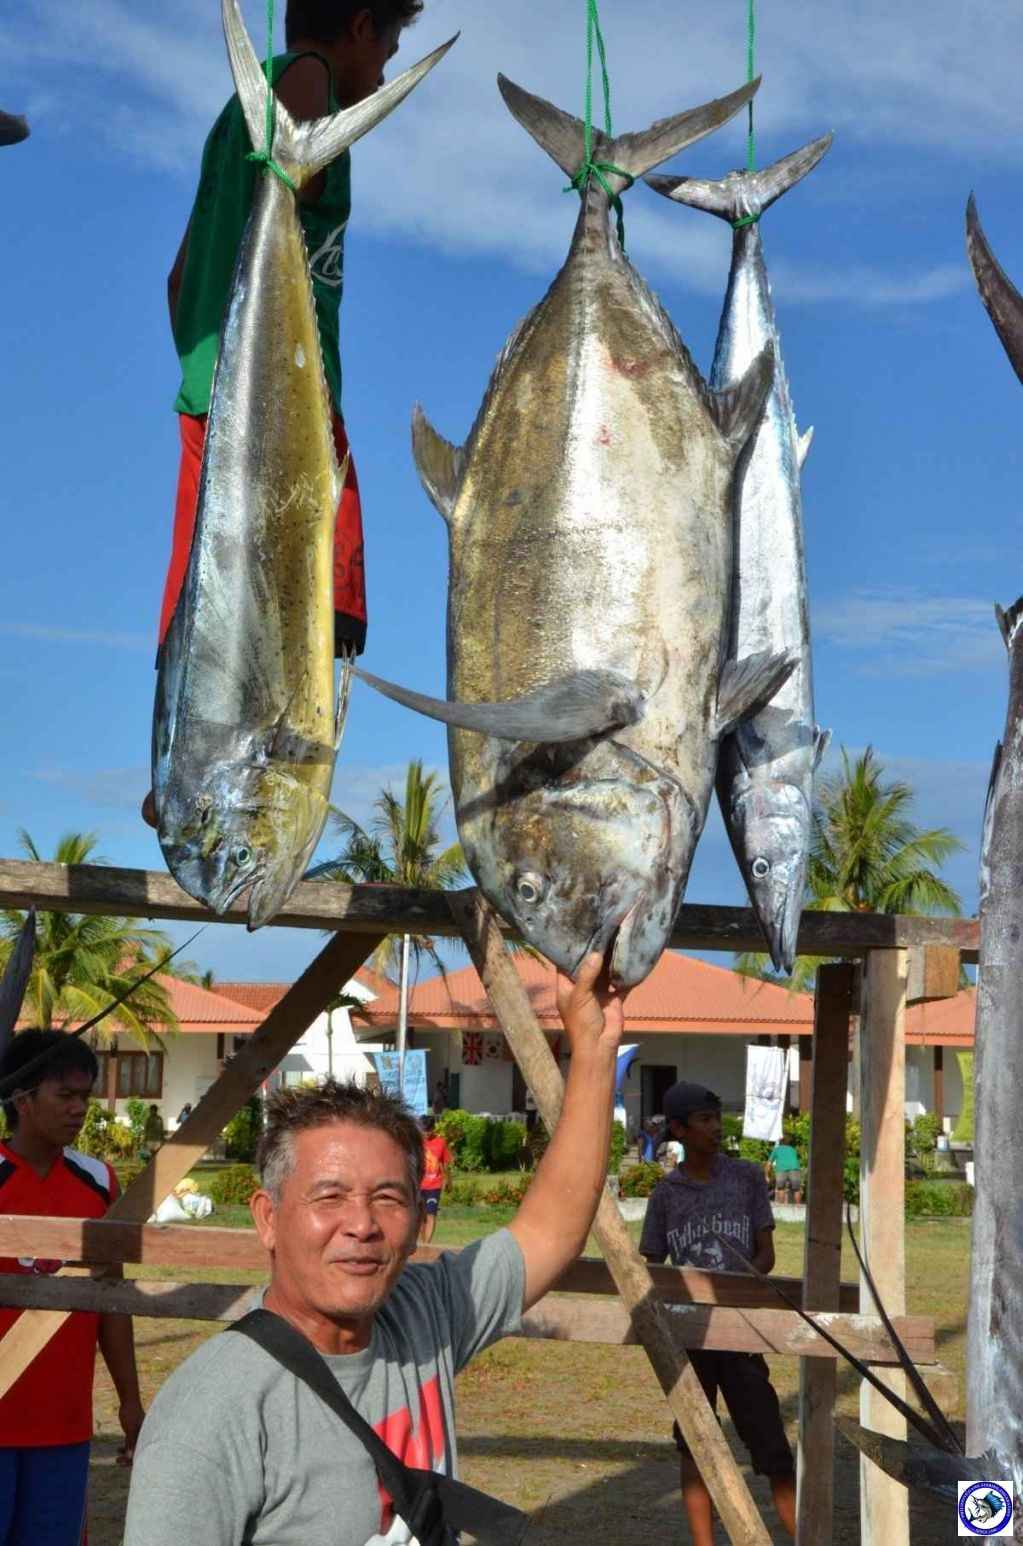 philippines Fishing Dsc_0248.jpg